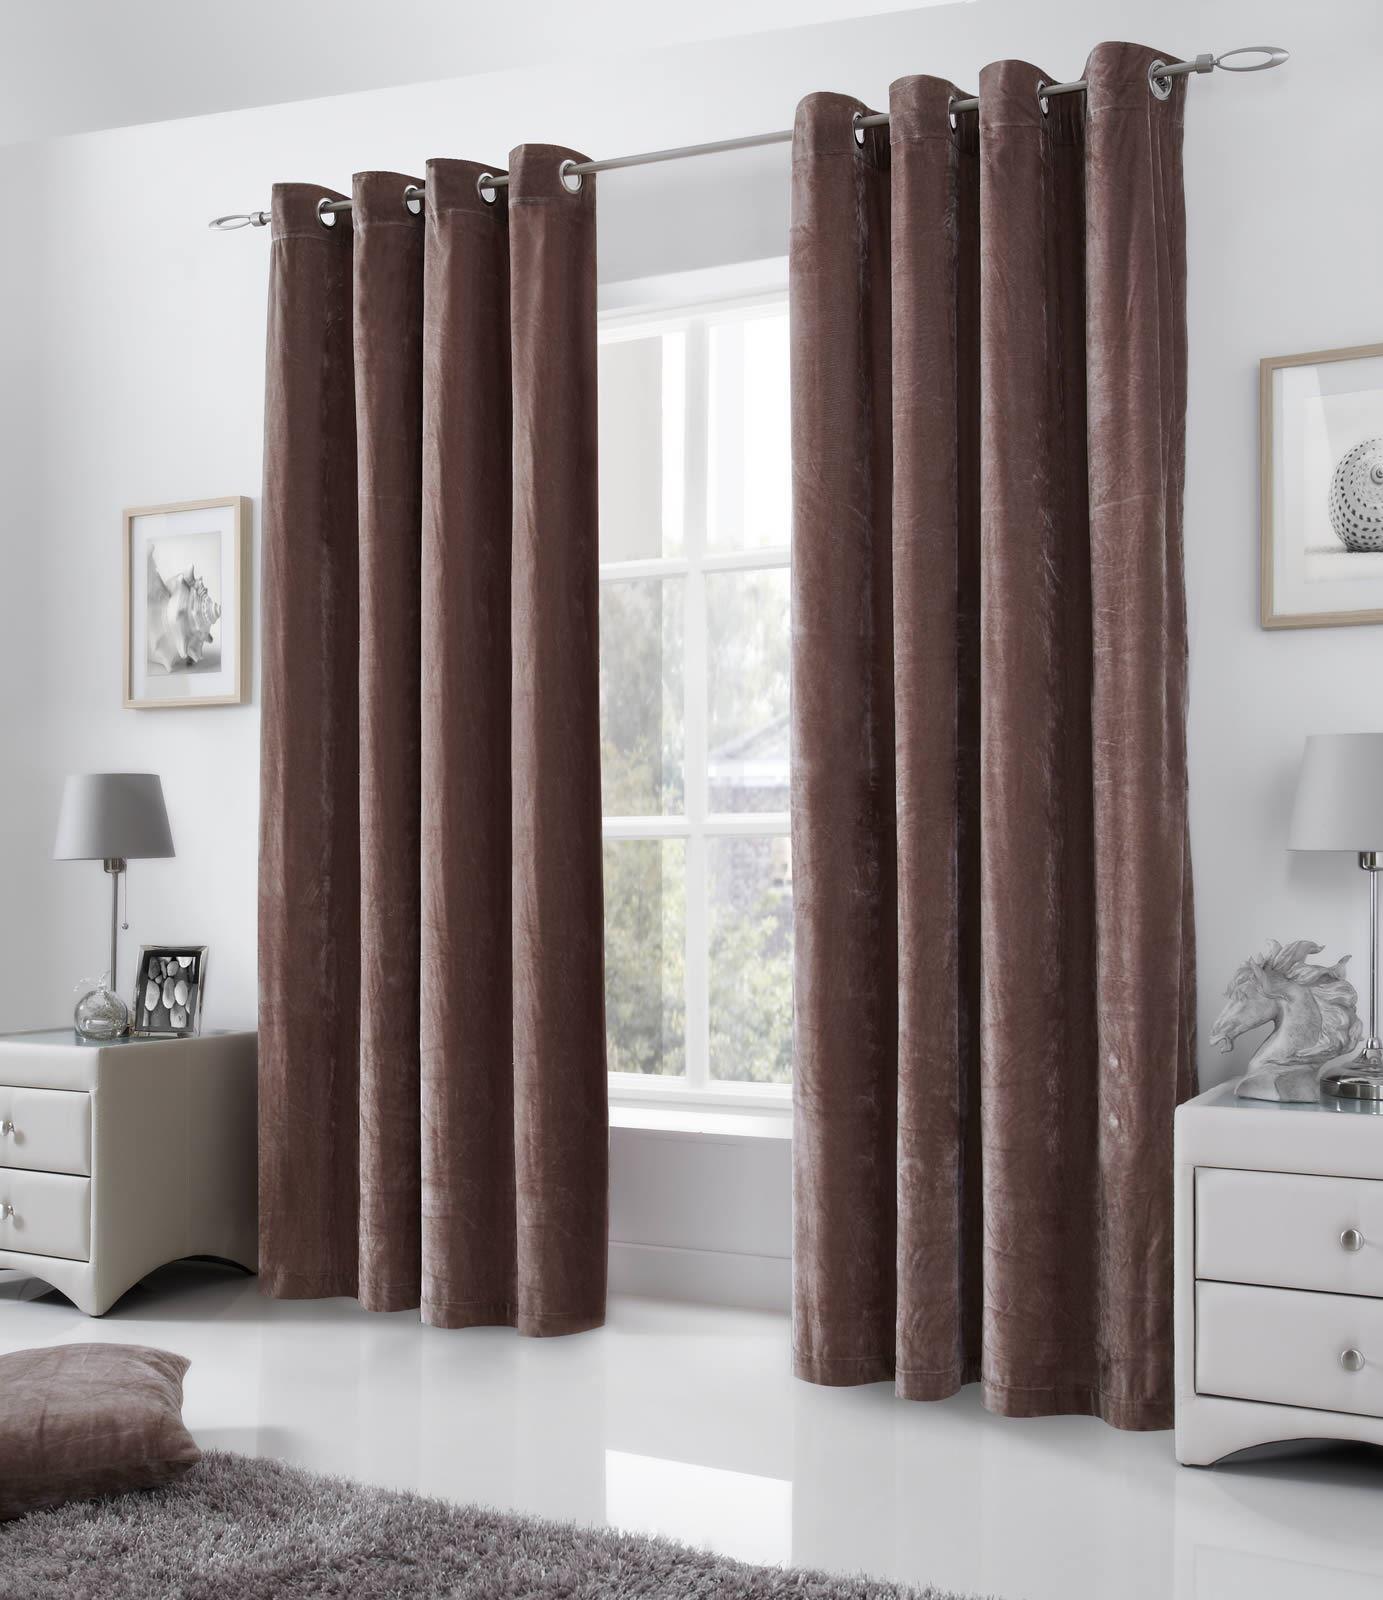 black velvet curtain velvet curtains eyelet lined curtains ringtop grey black mink red cream